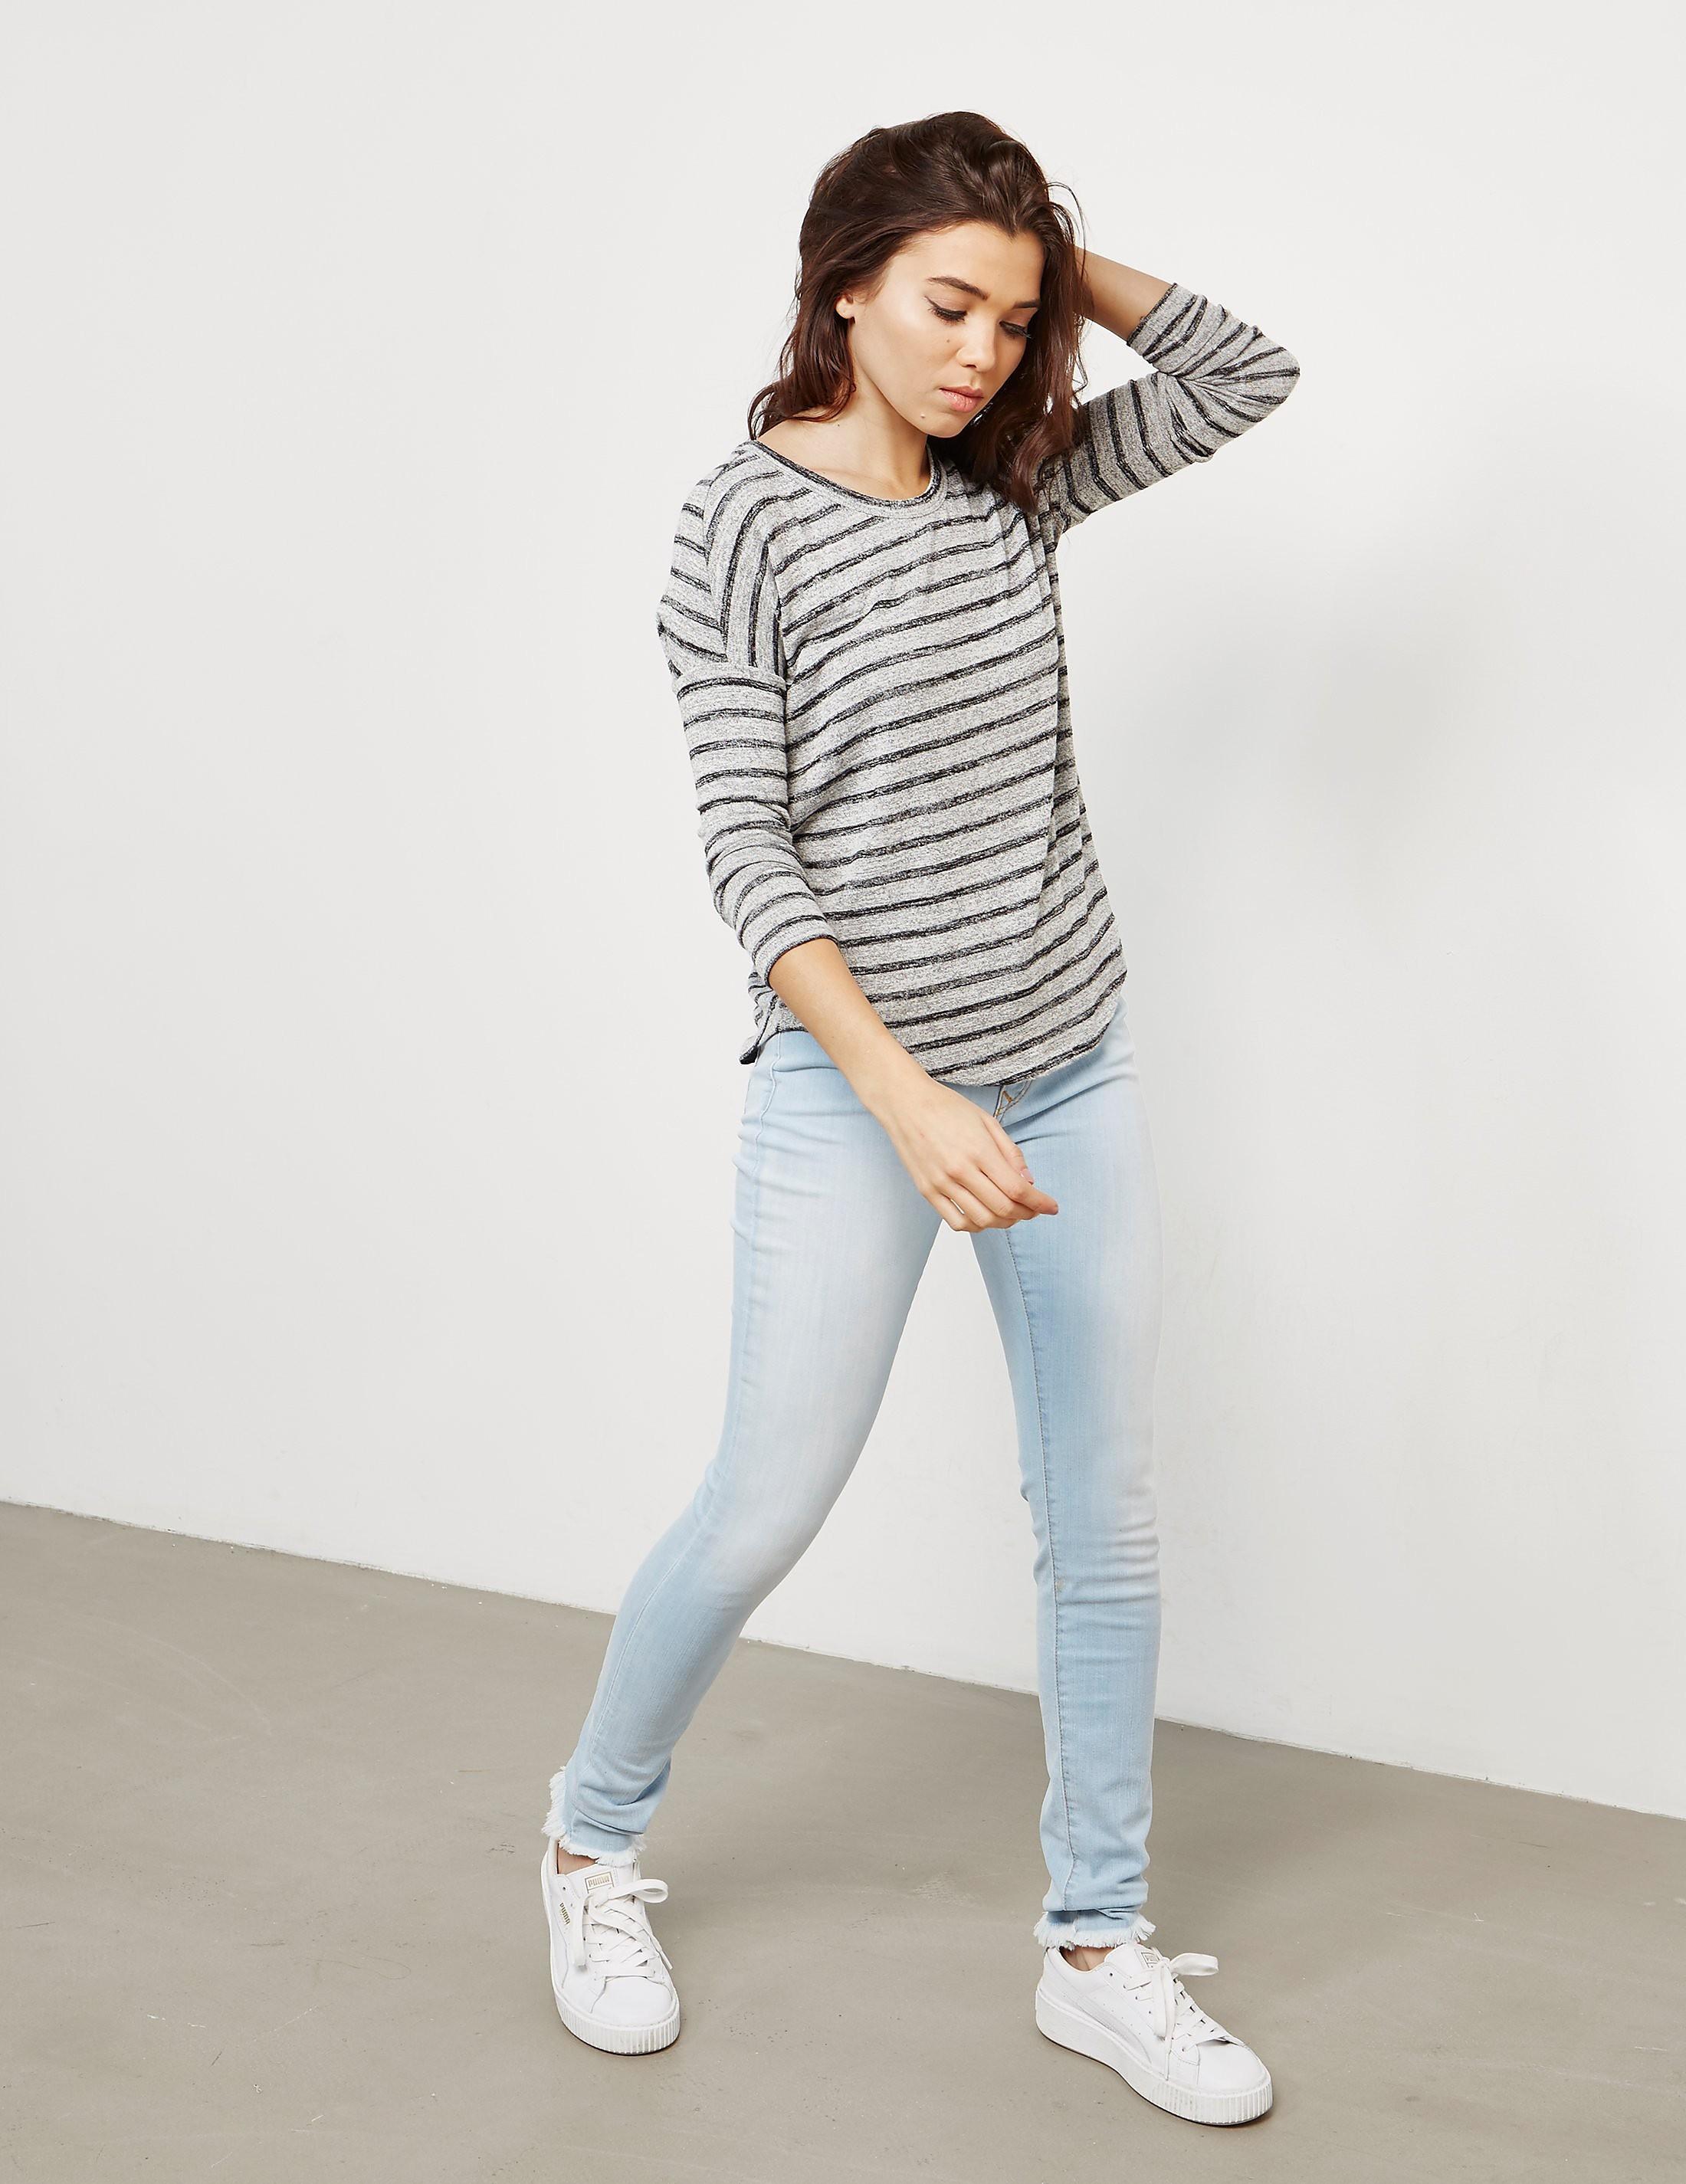 Vivienne Westwood Anglomania Super Skinny Jeans